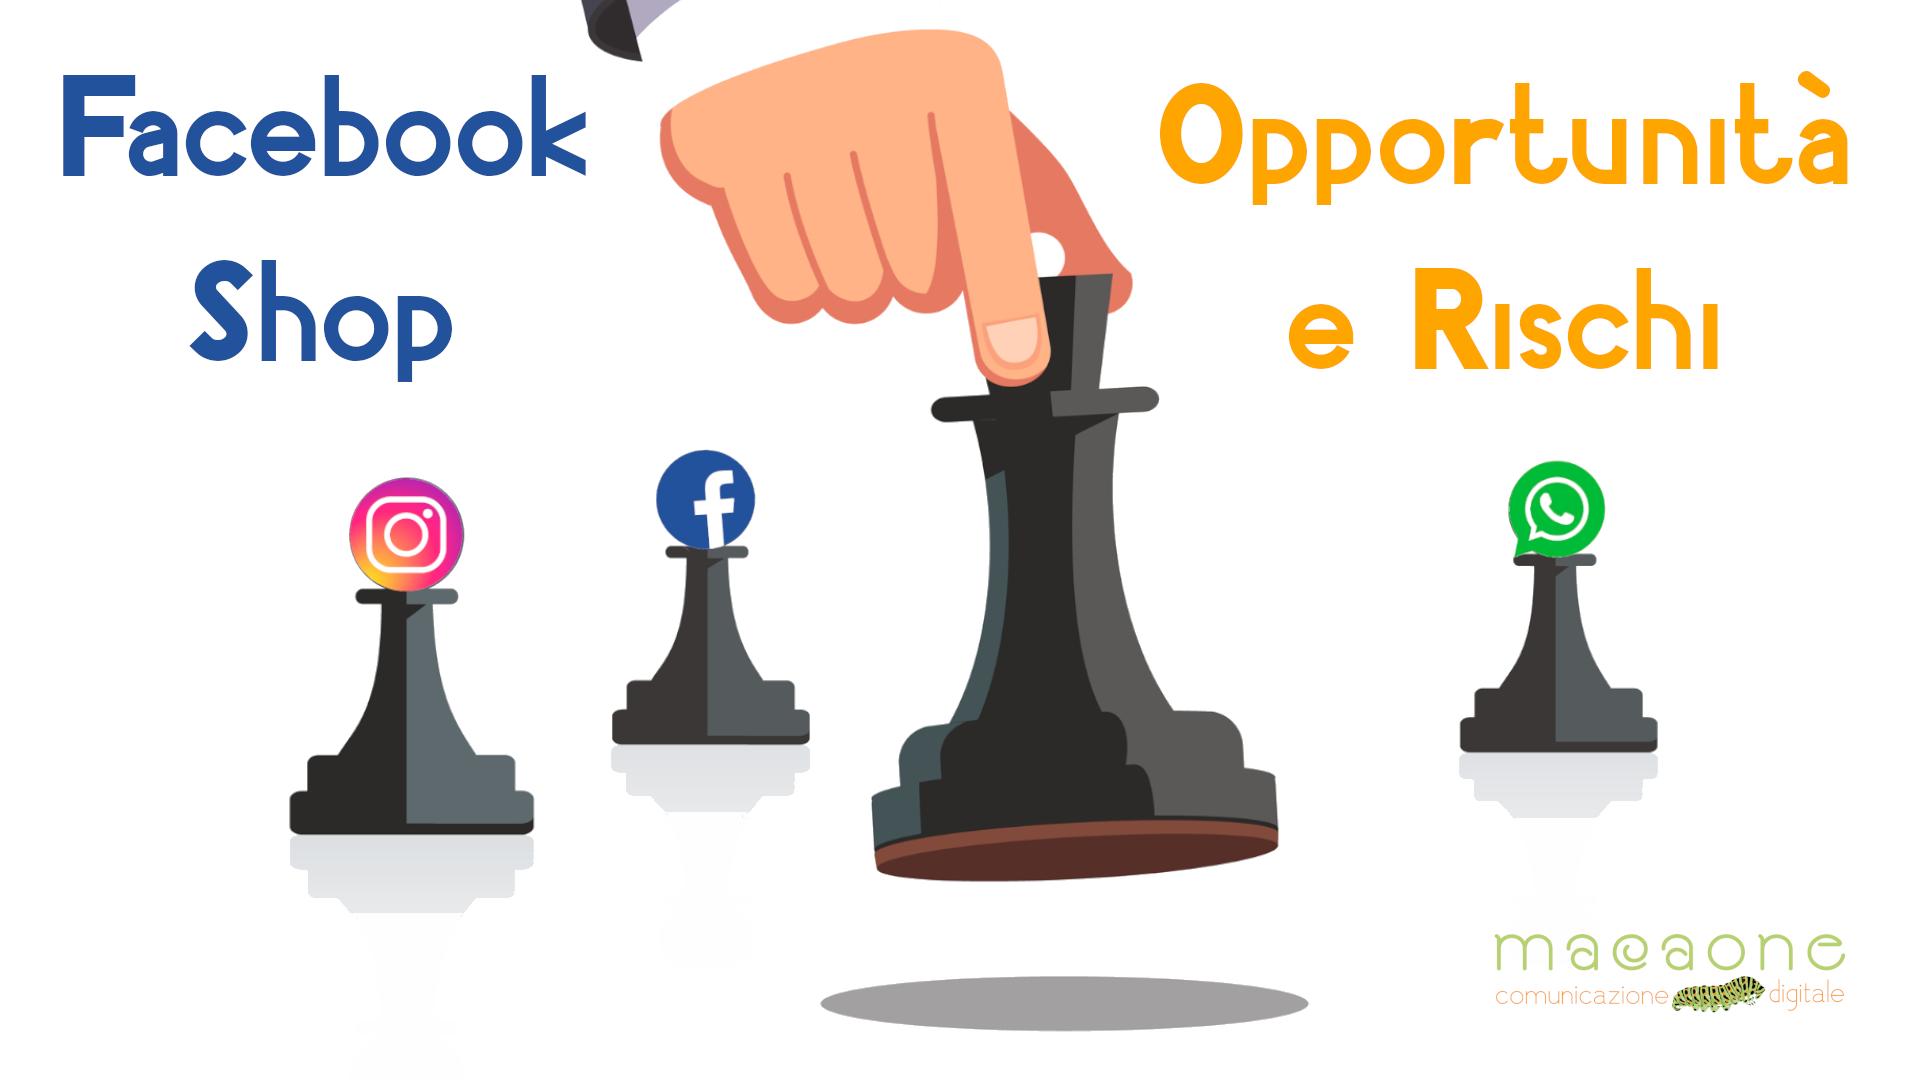 facebookshop-opportunitàerischi